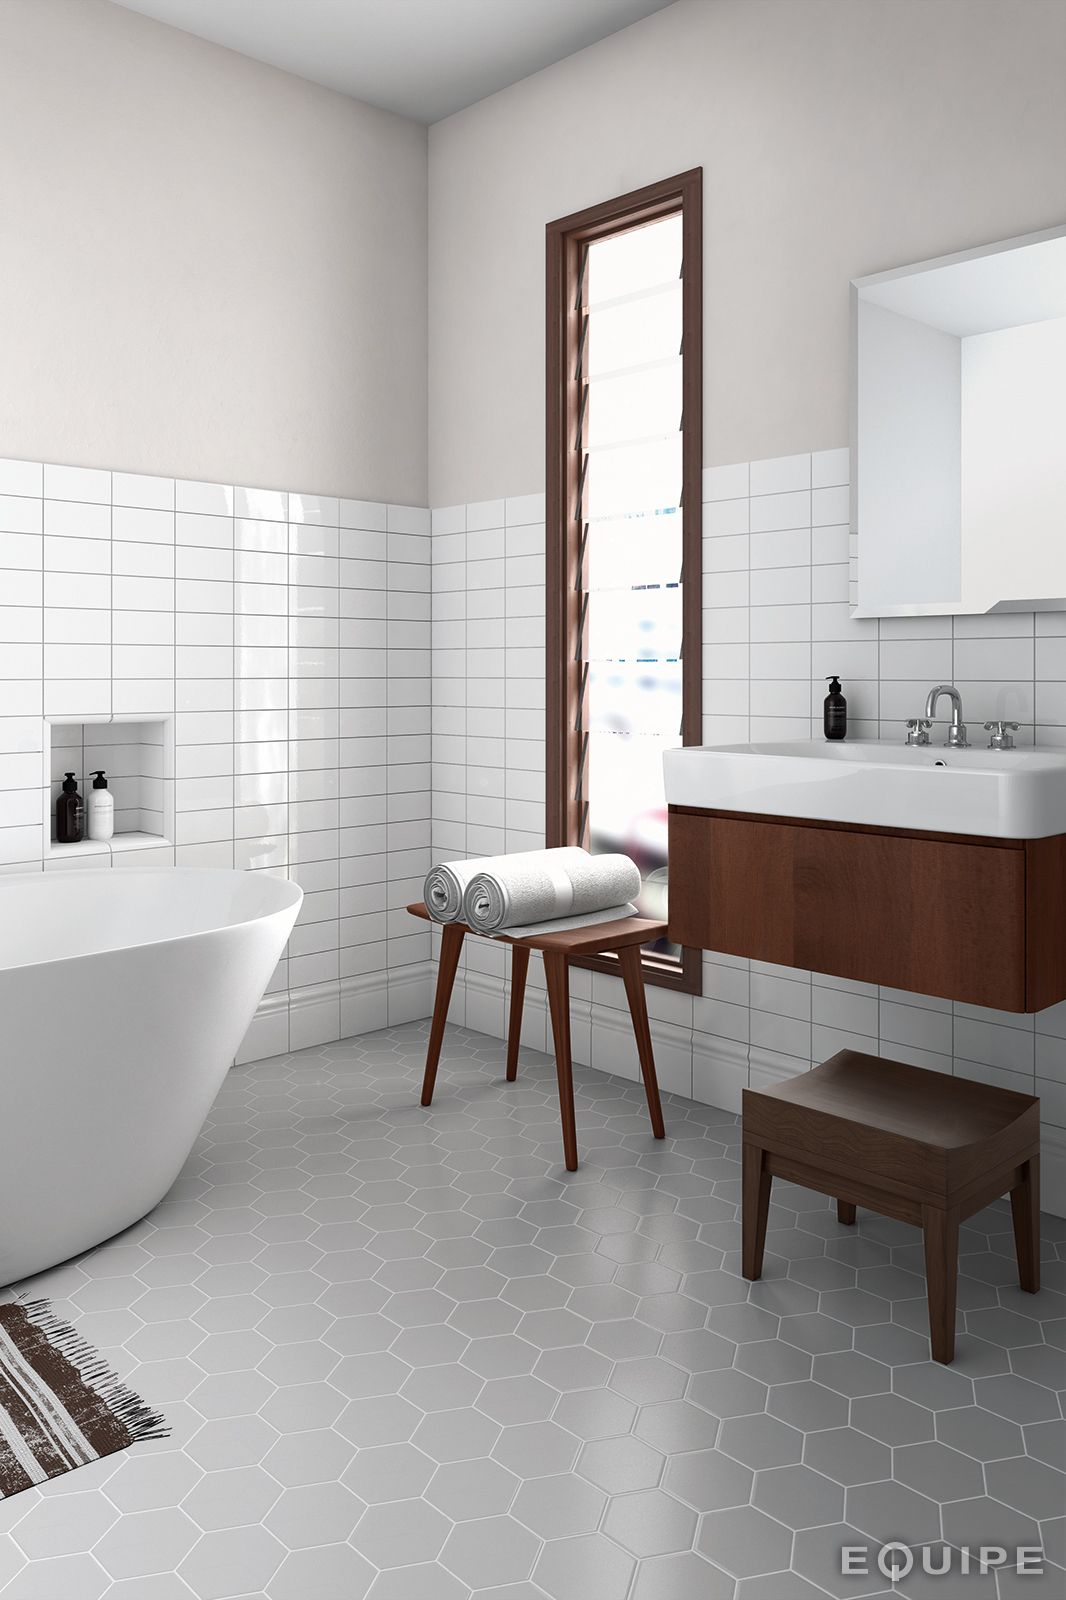 Scale grey 116x101 floor tile with horizontal subway tile scale grey 116x101 floor tile with horizontal subway tile bathroom doublecrazyfo Images